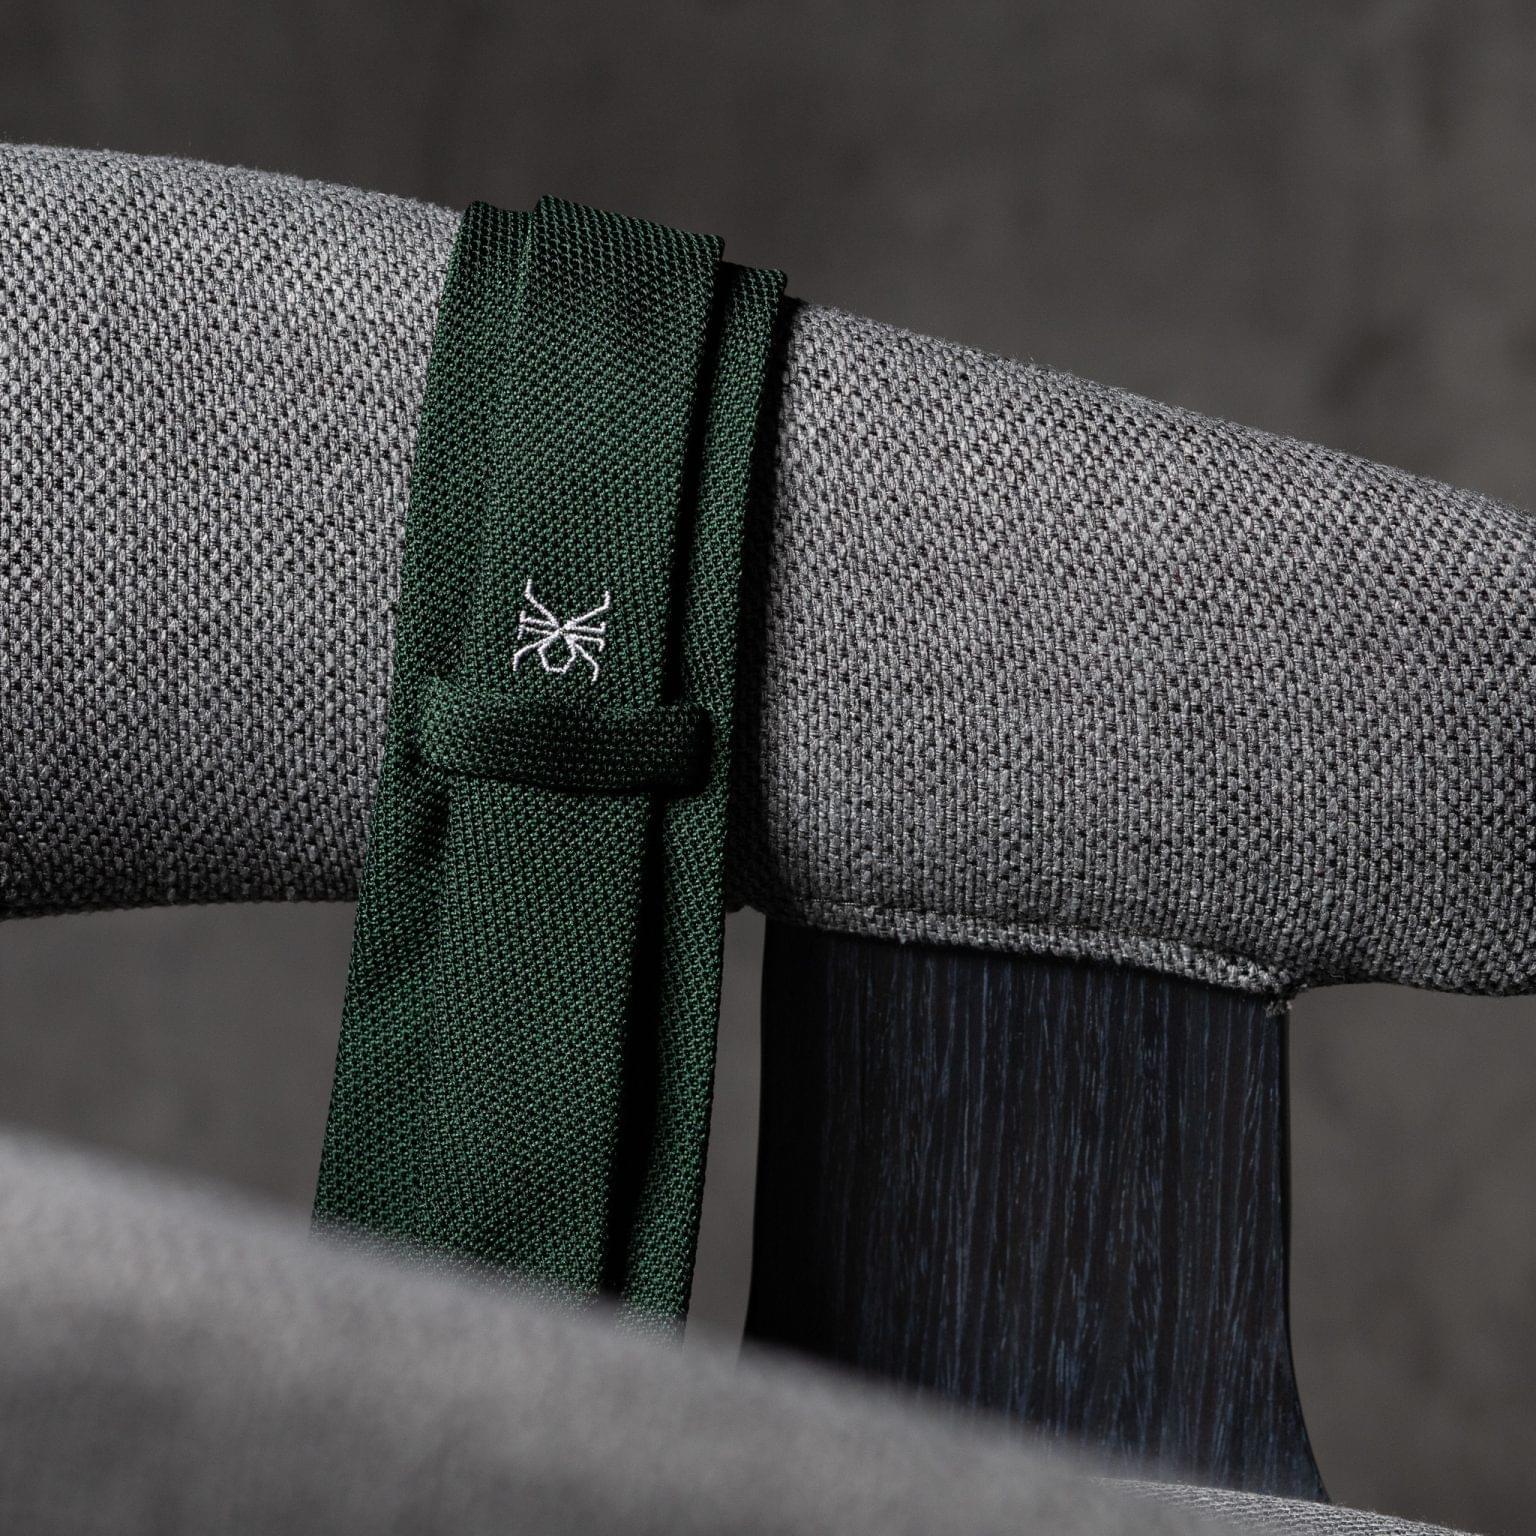 GRENADINE-0148-Tie-Initials-Corbata-Iniciales-The-Seelk-4